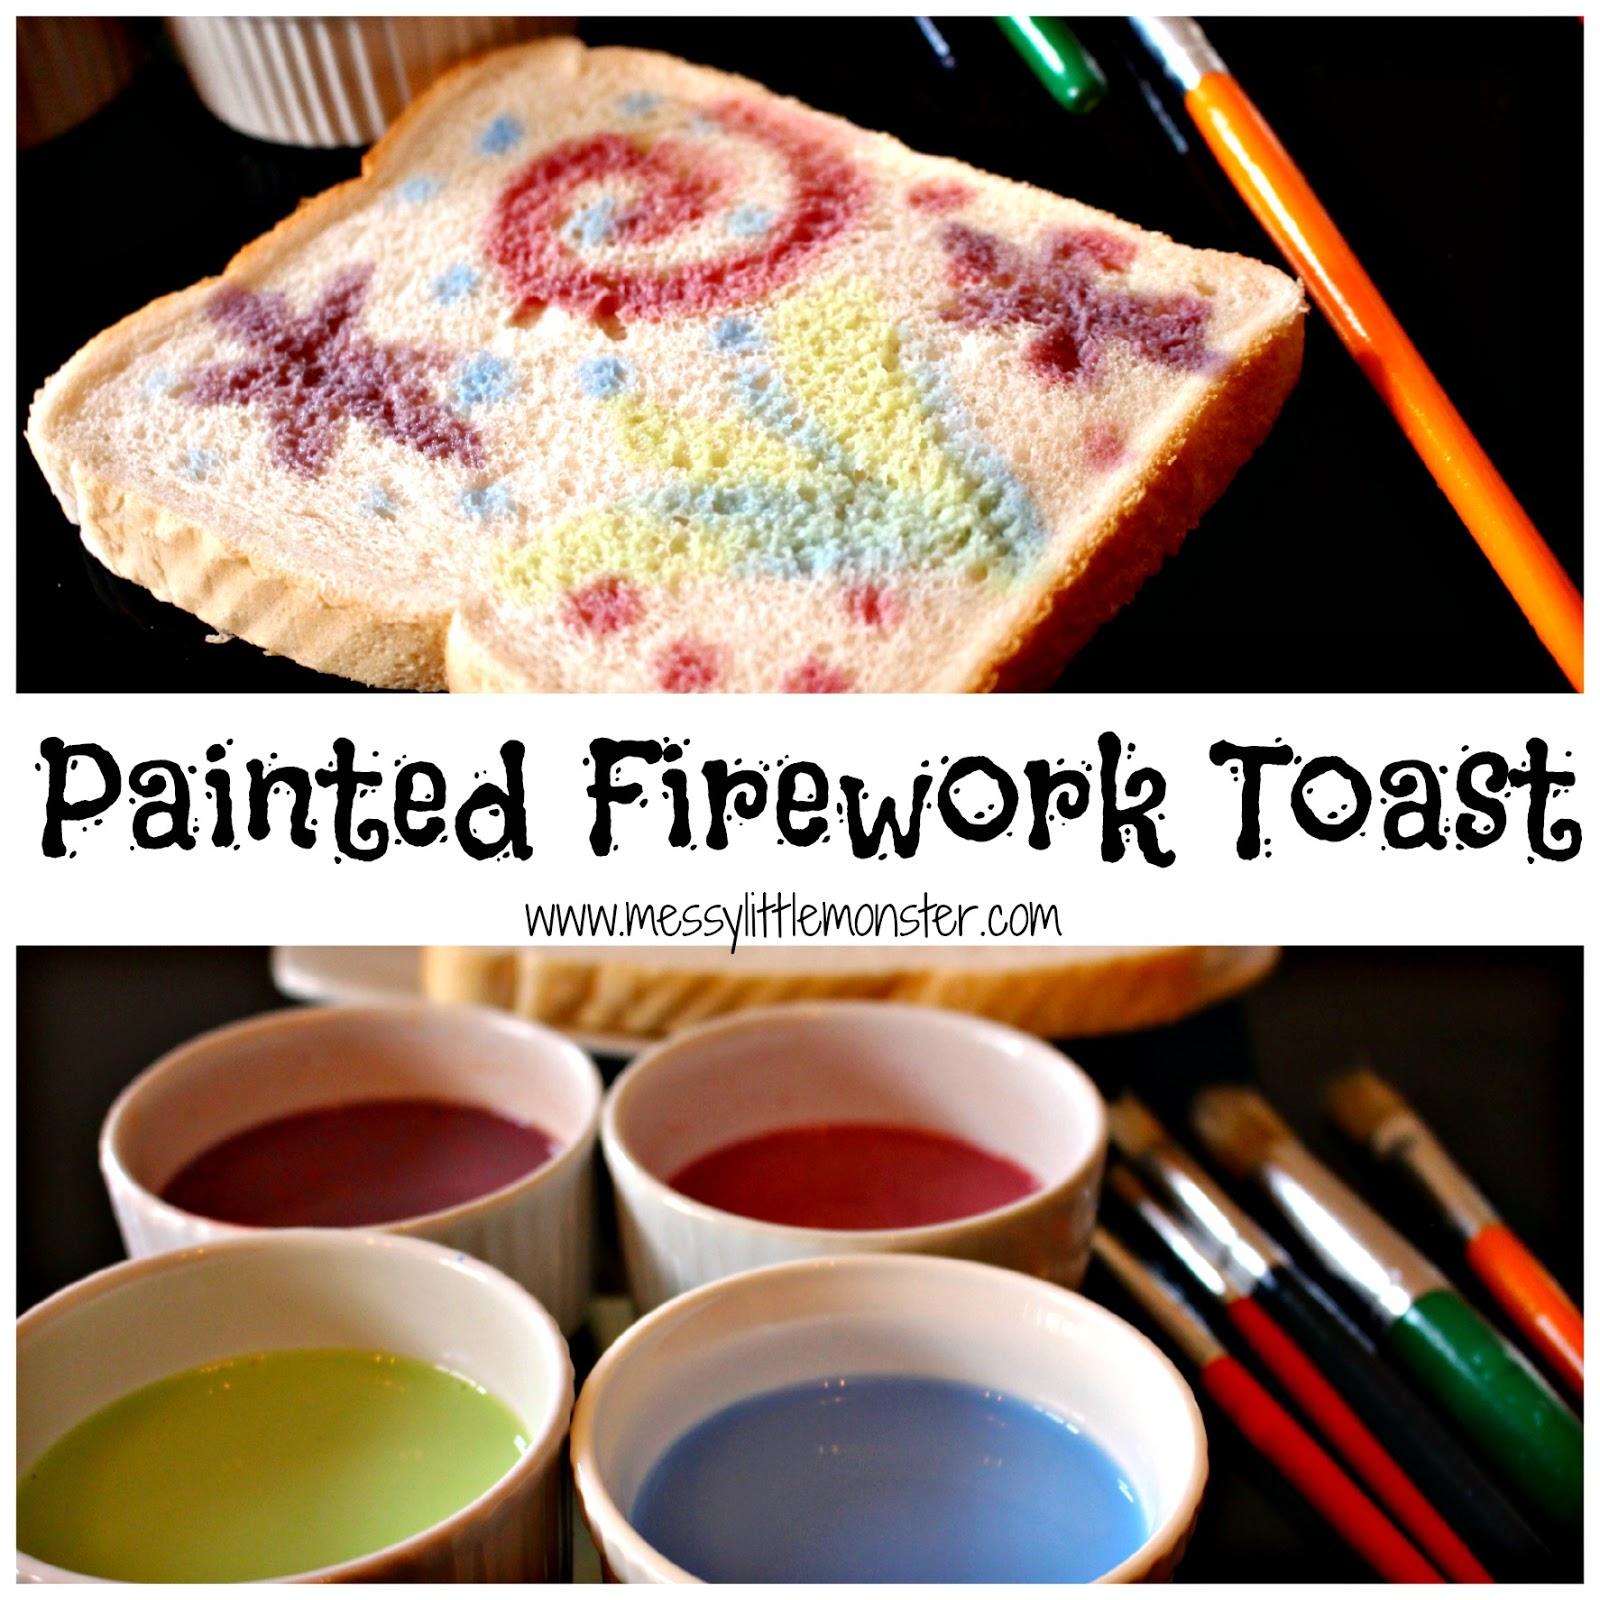 http://www.messylittlemonster.com/2014/11/painted-firework-toast.html